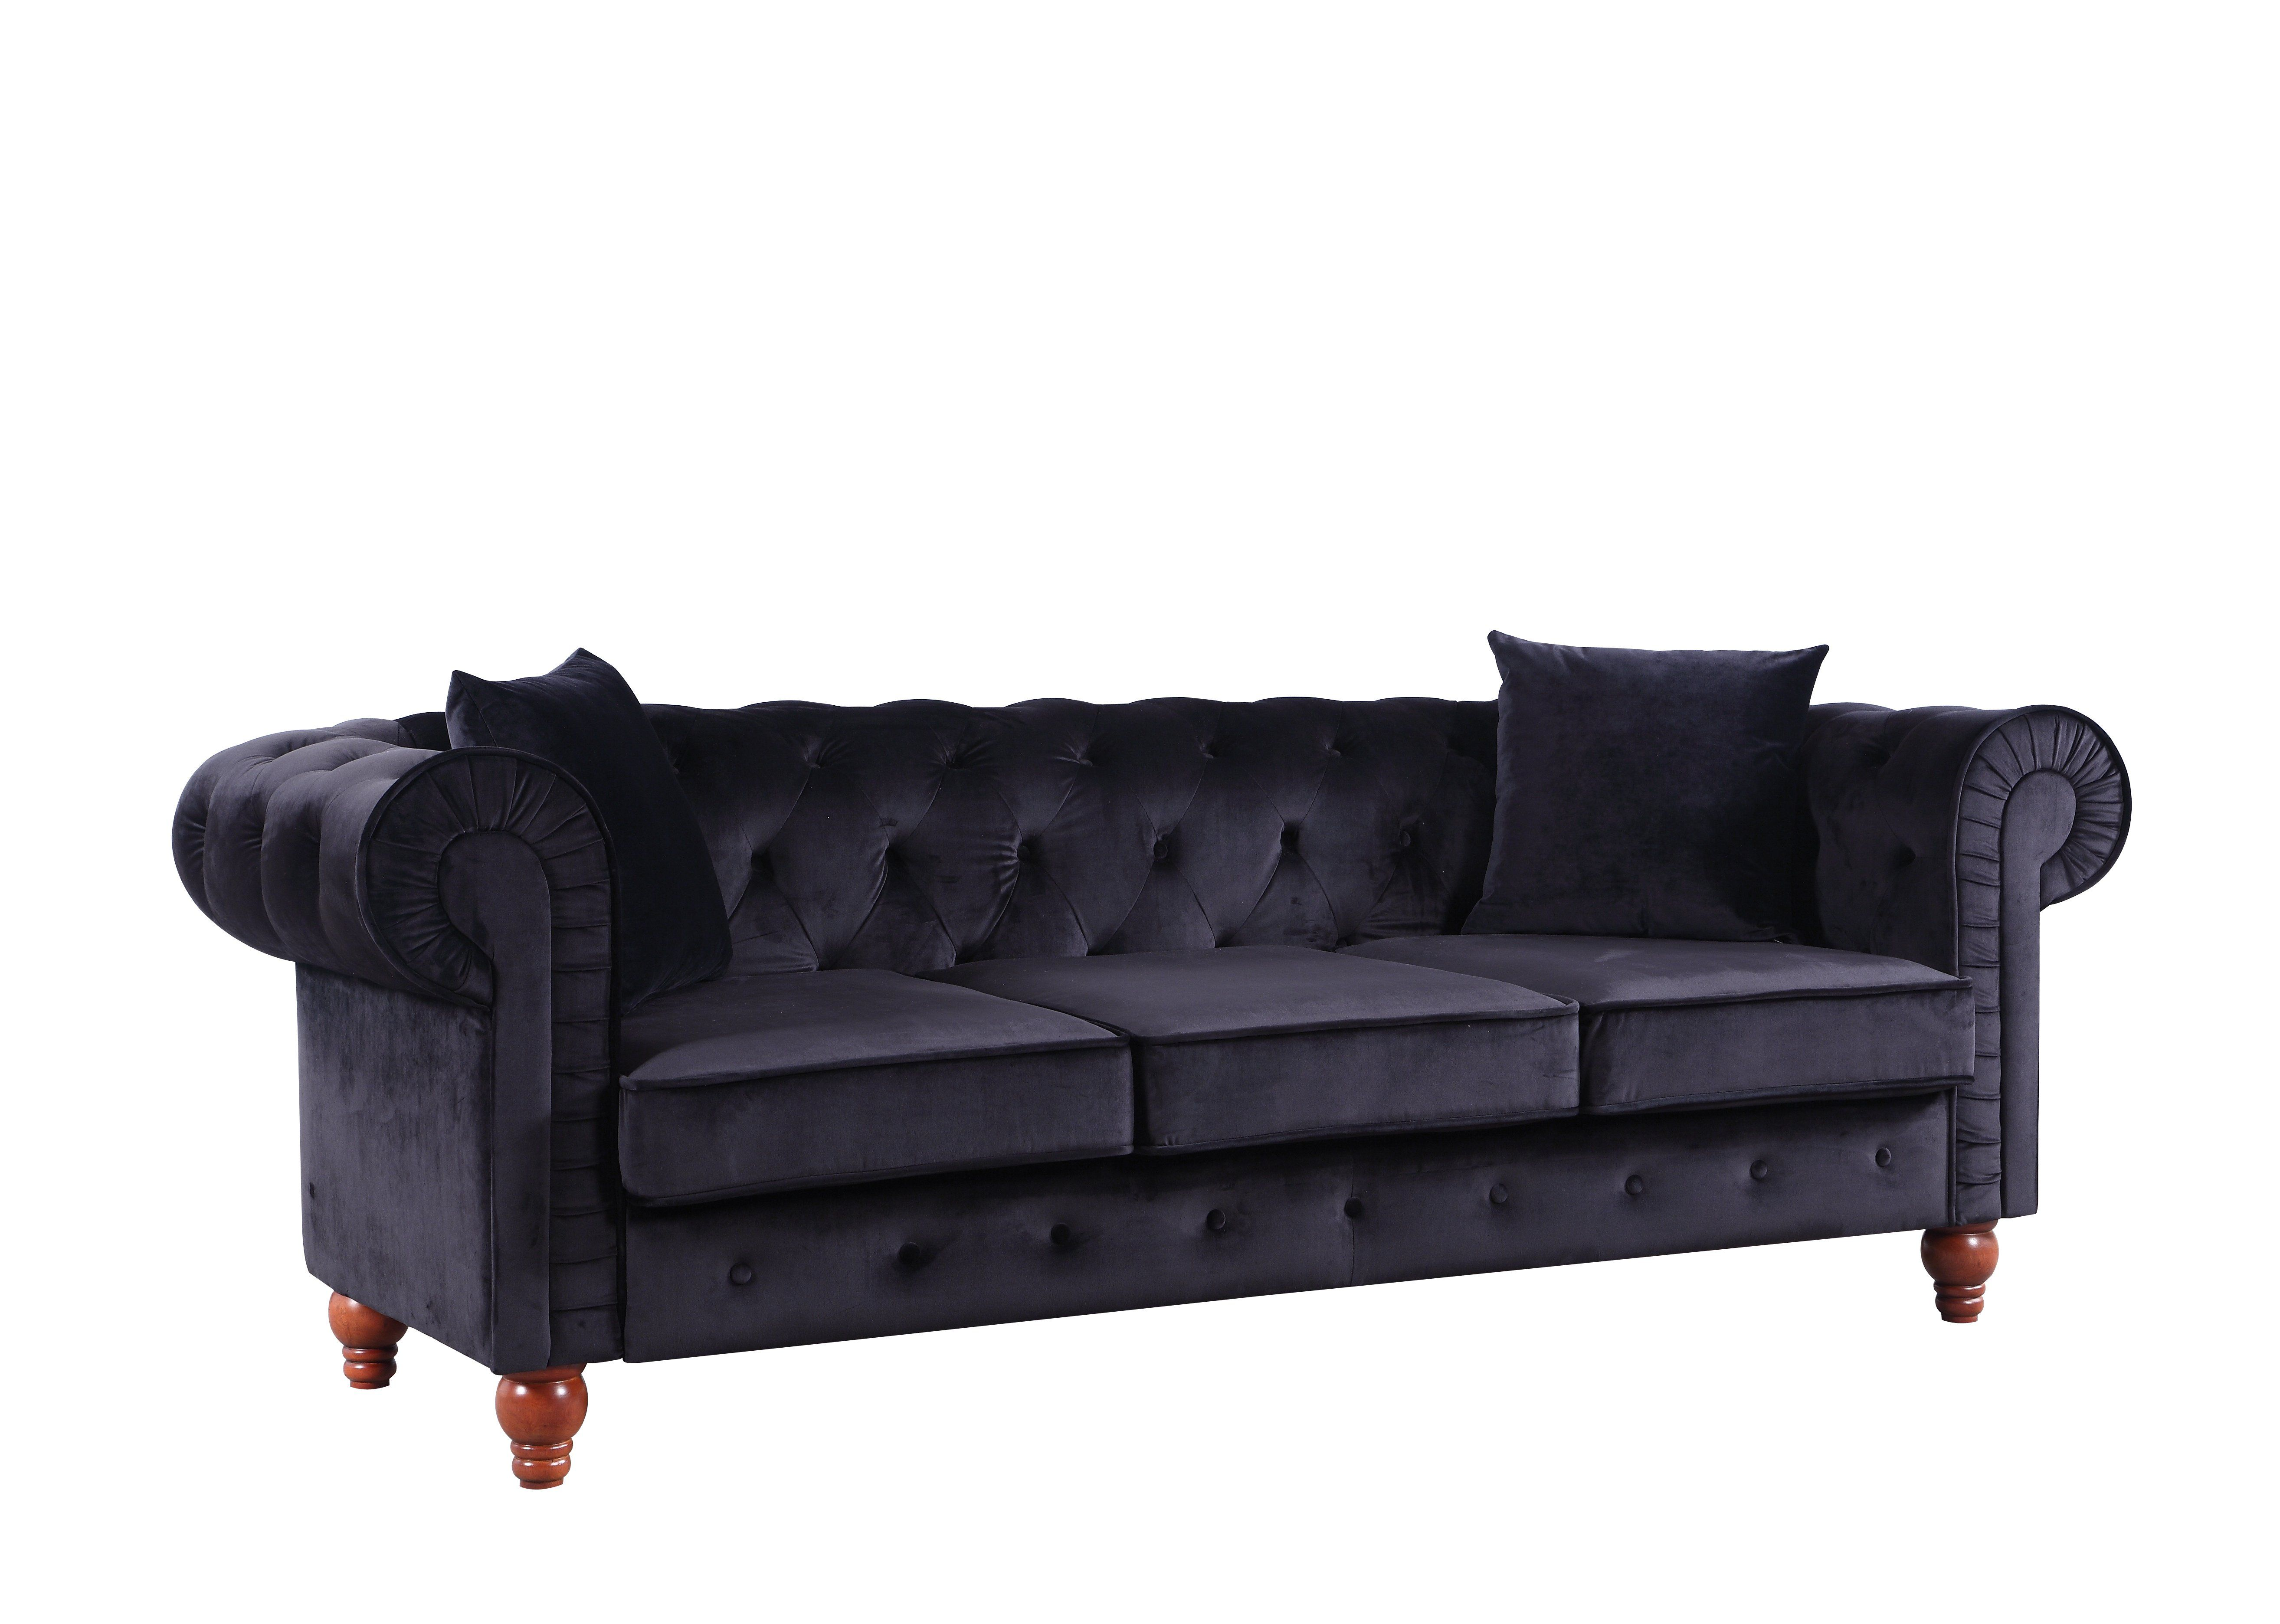 Stratford Classic Velvet Fabric Chesterfield Sofa